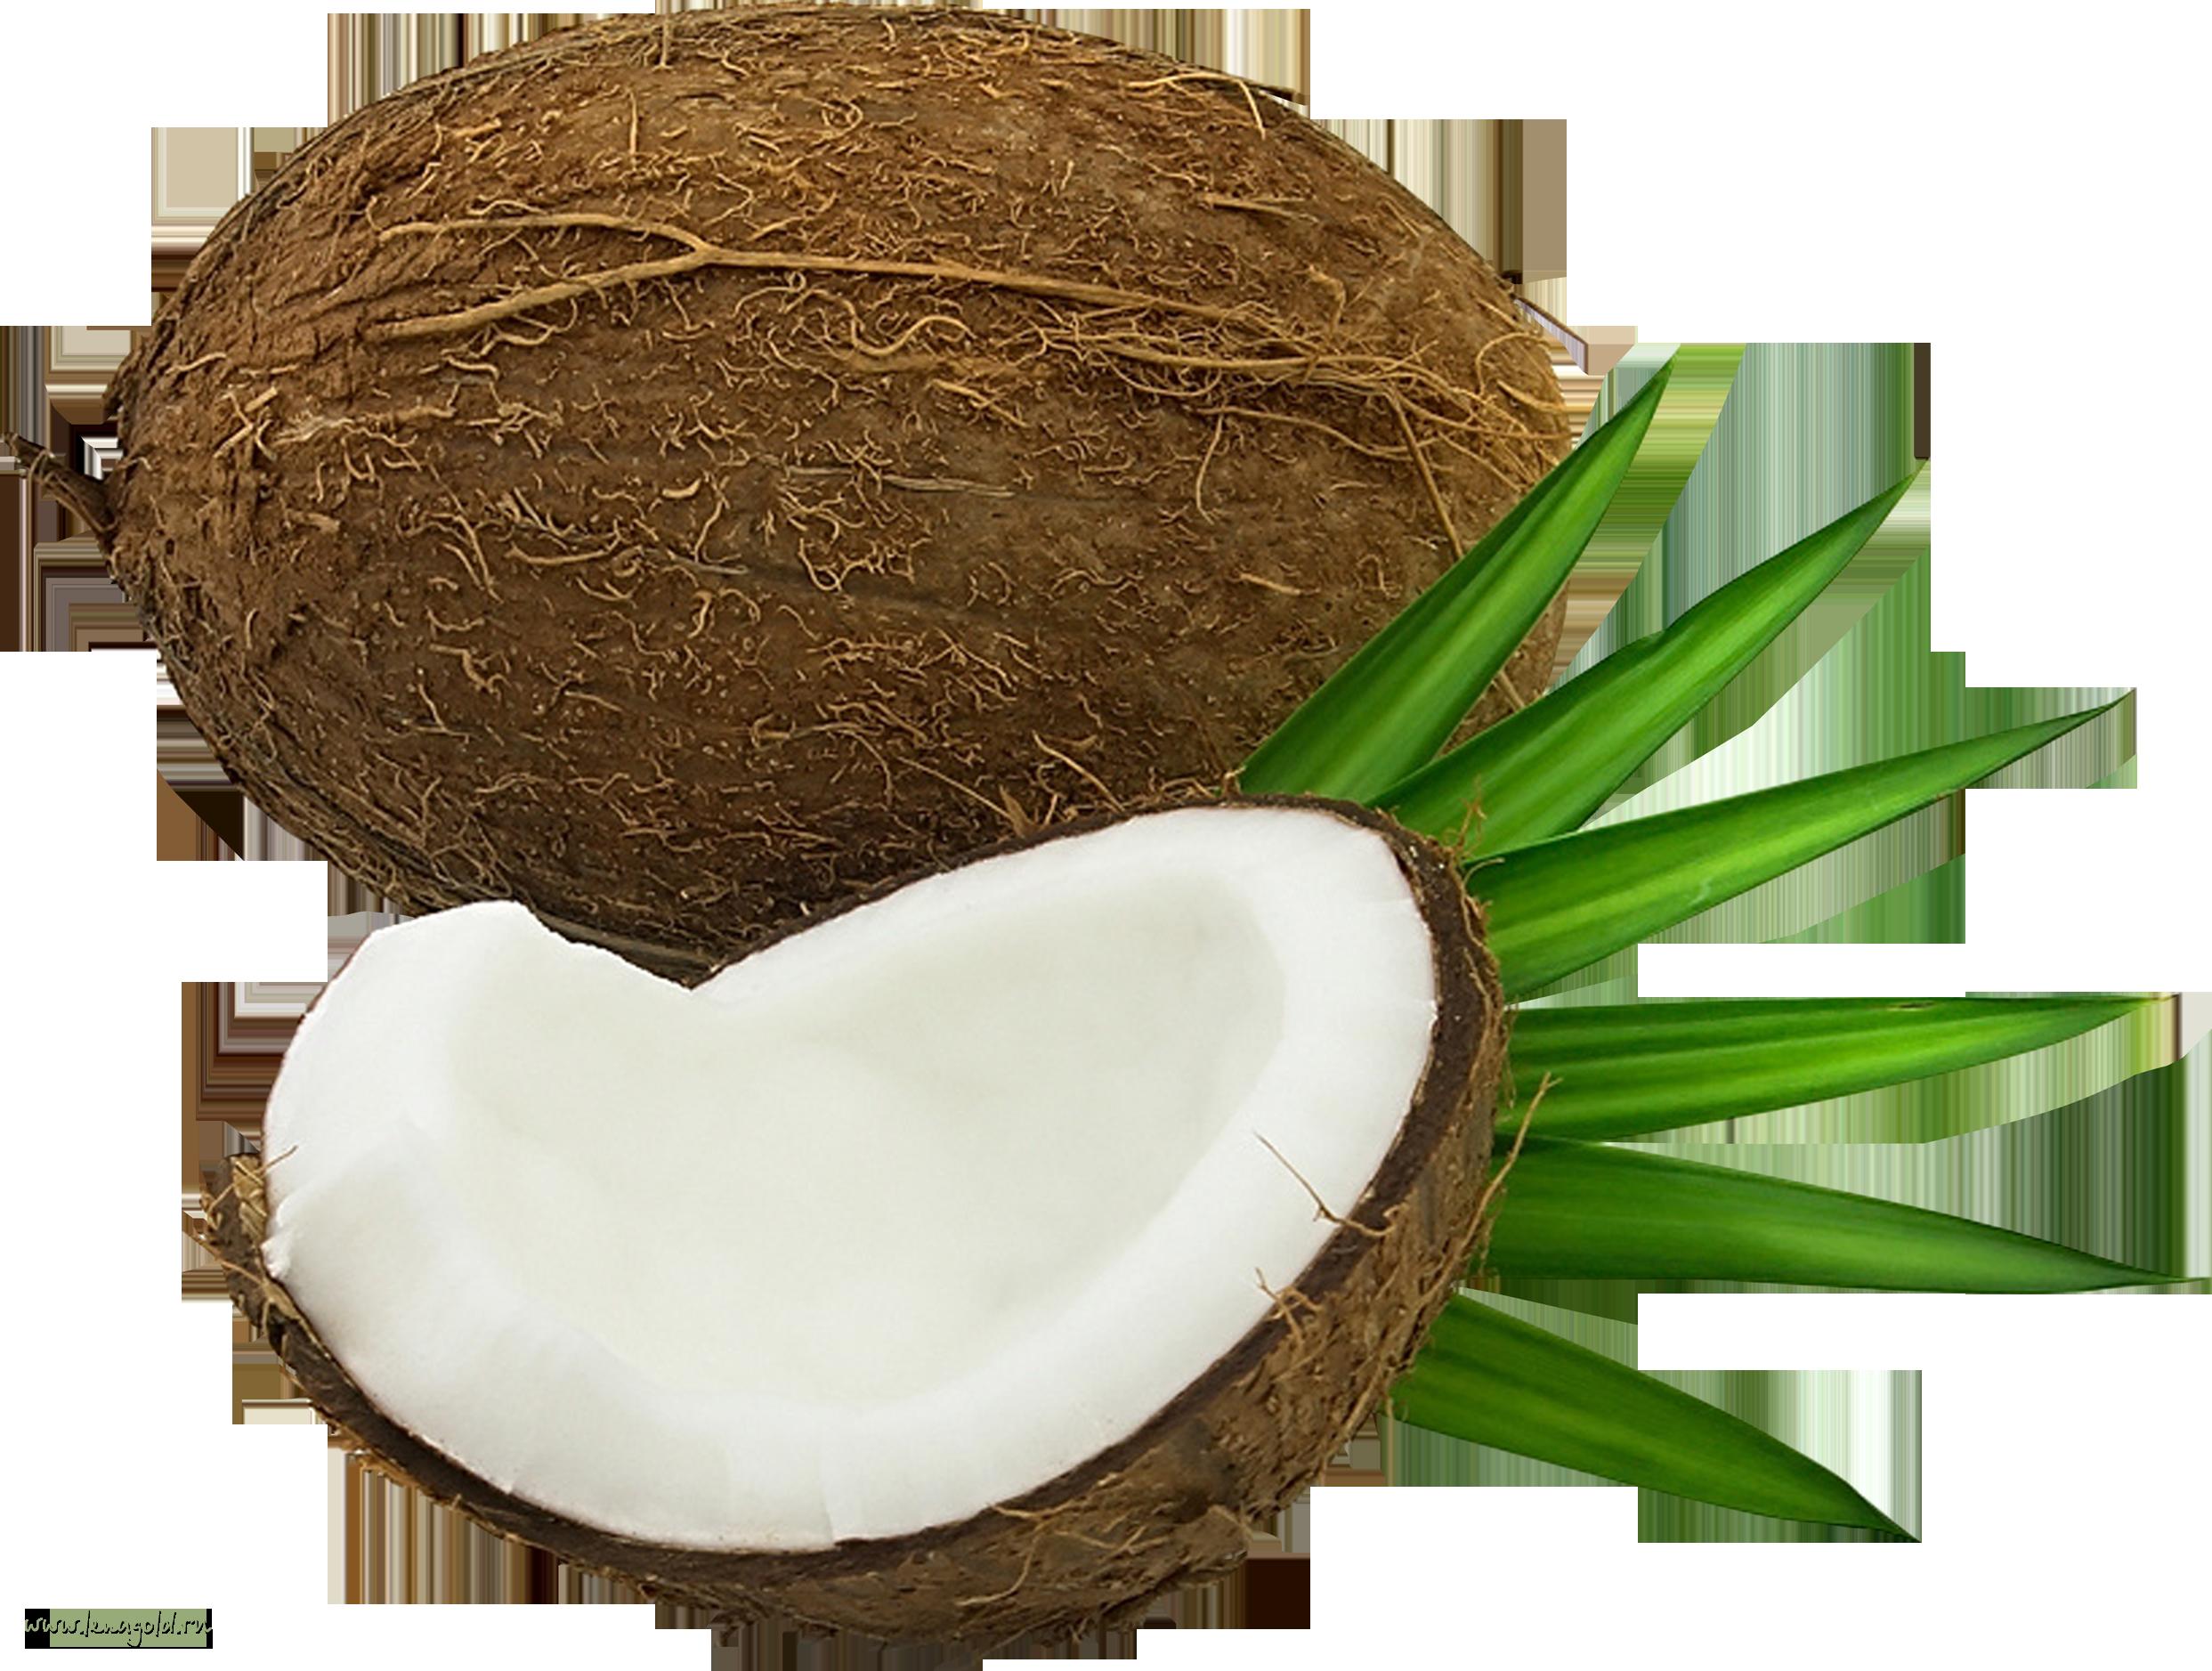 Coconut clipart coconut husk. Png image